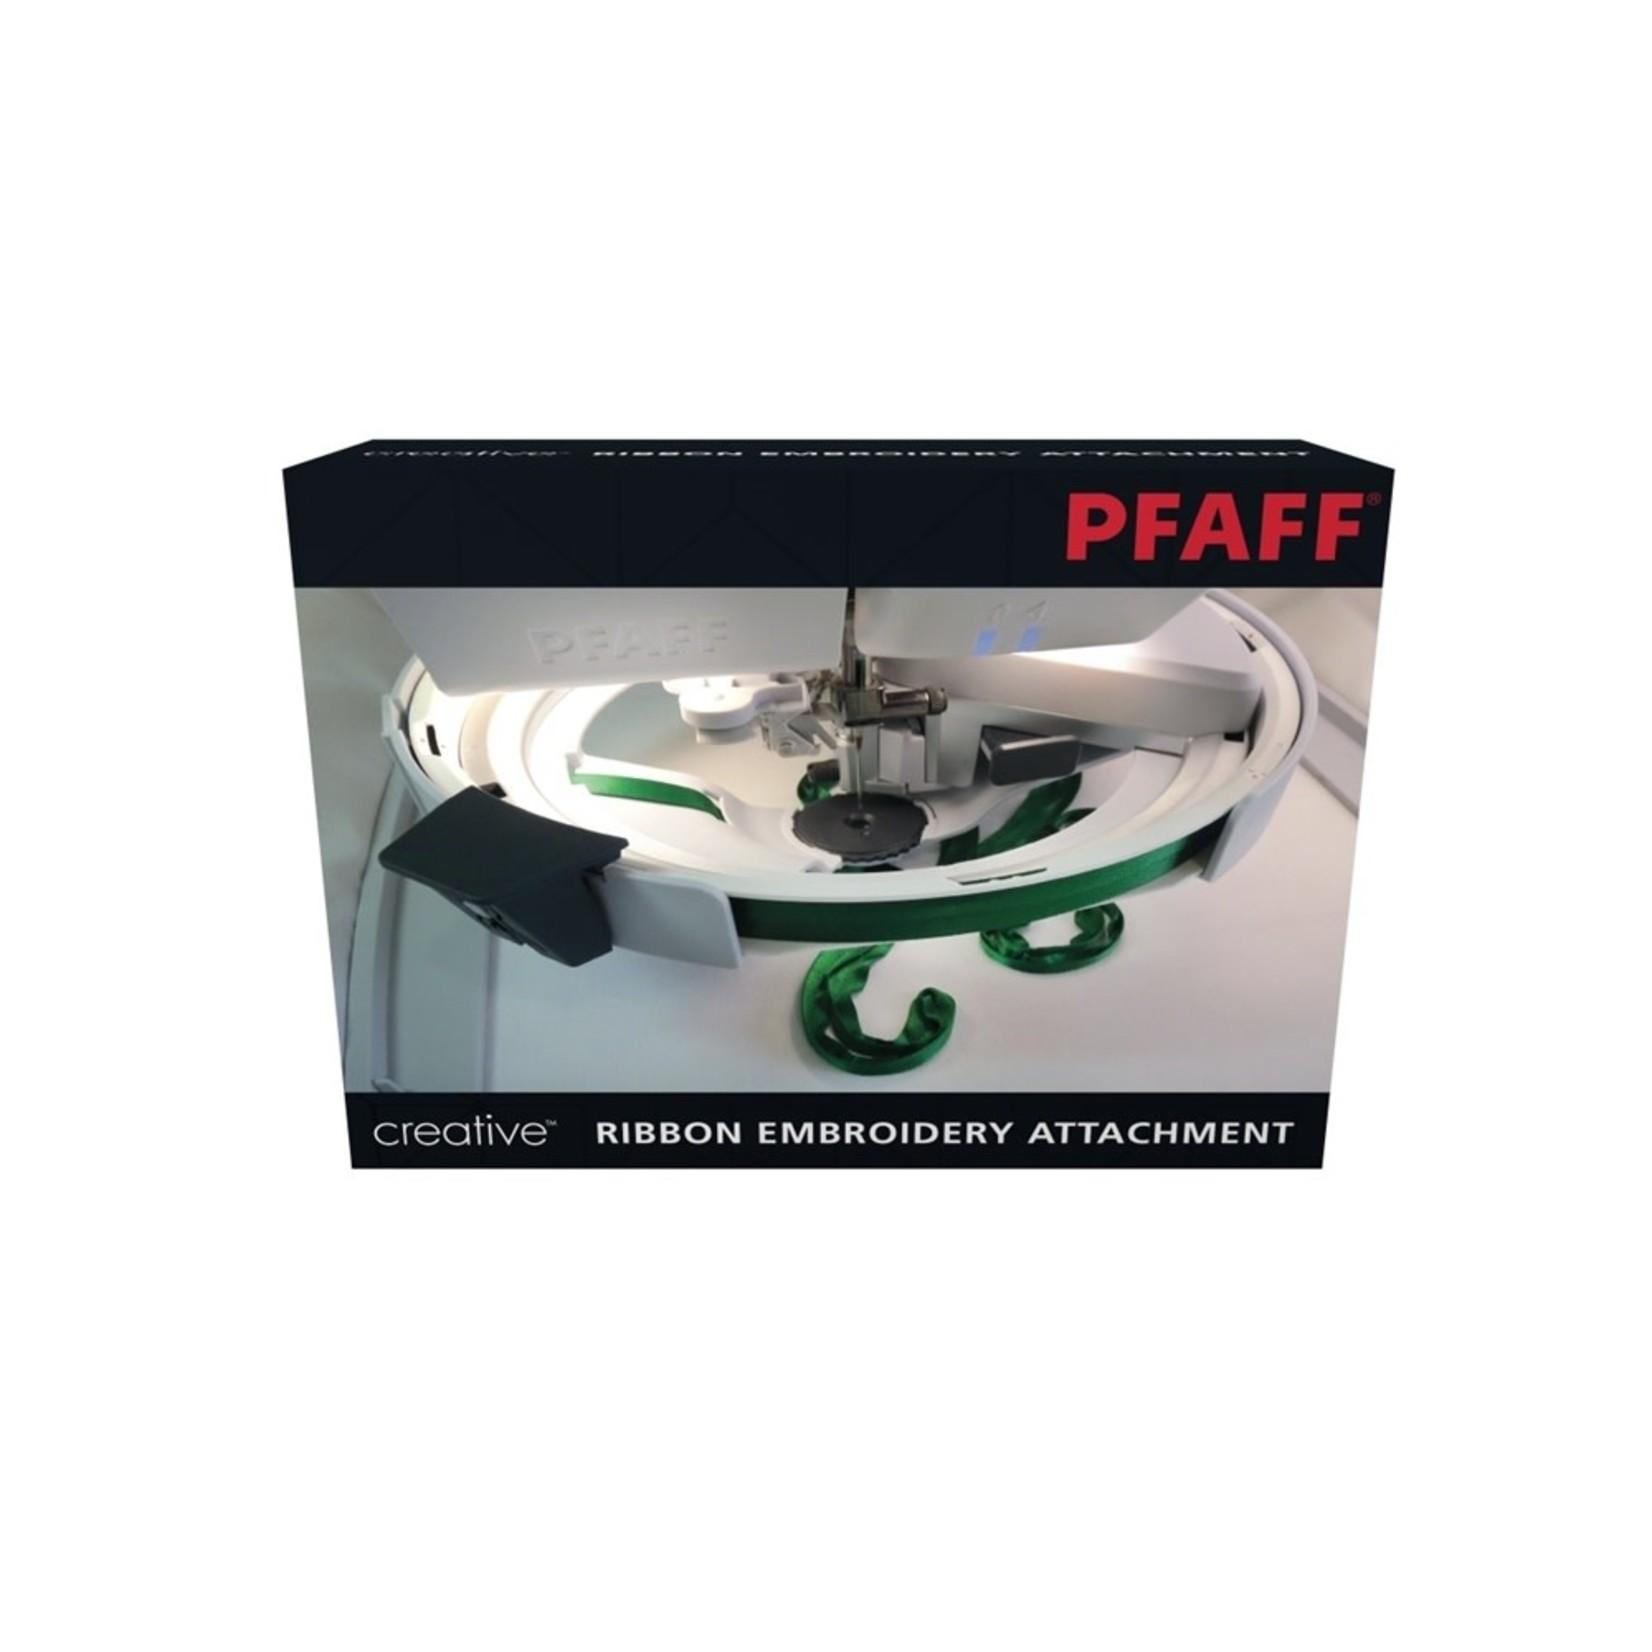 Pfaff Ribbon Embroidery Attachment - PFAFF